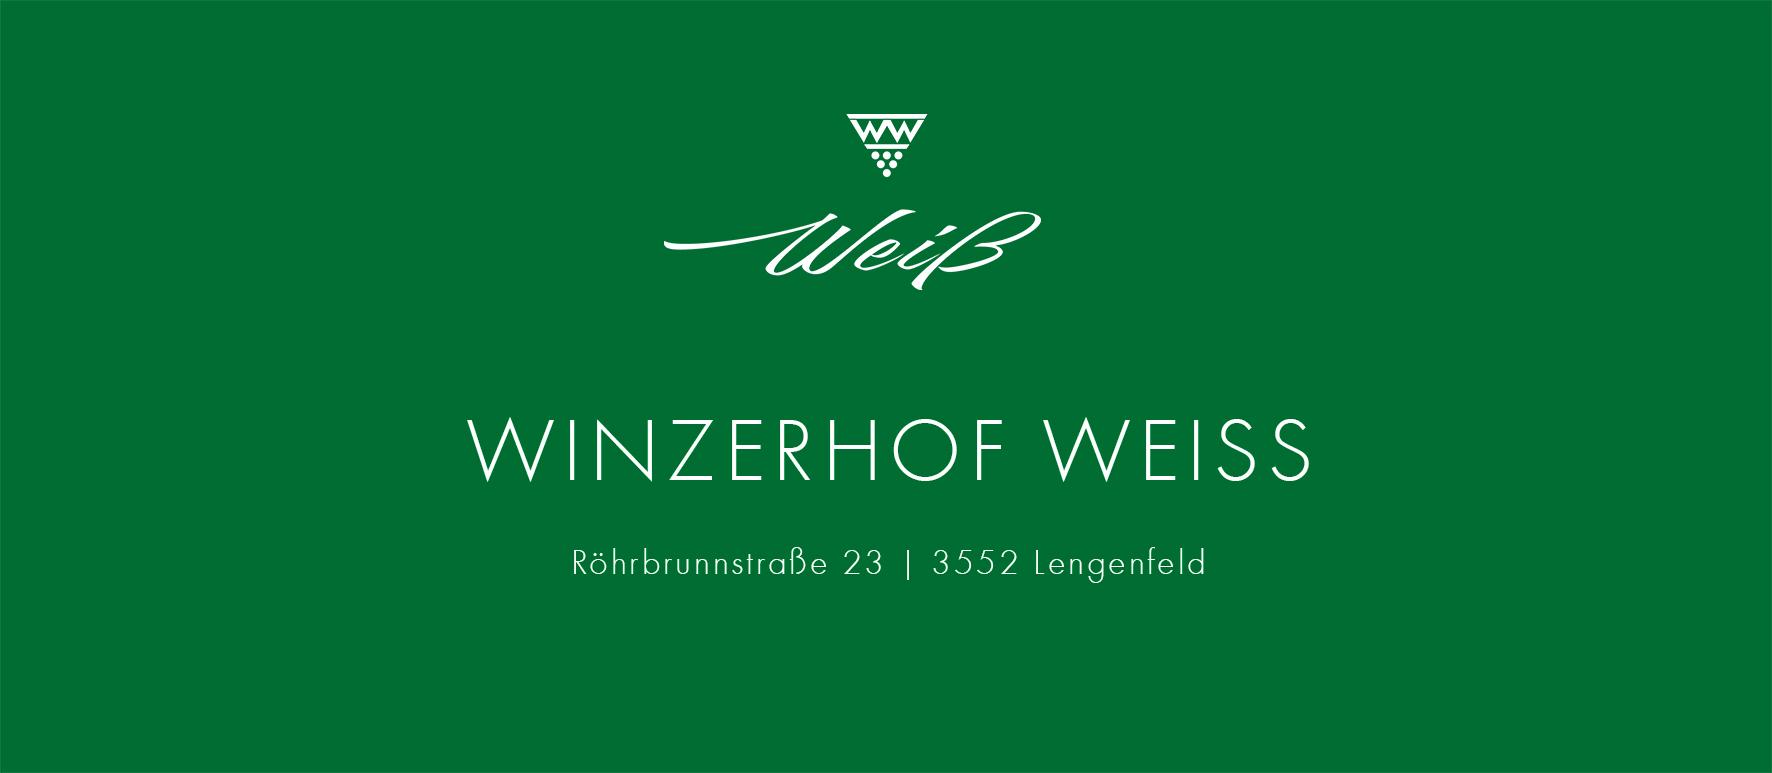 Winzerhof_weiss_slider01